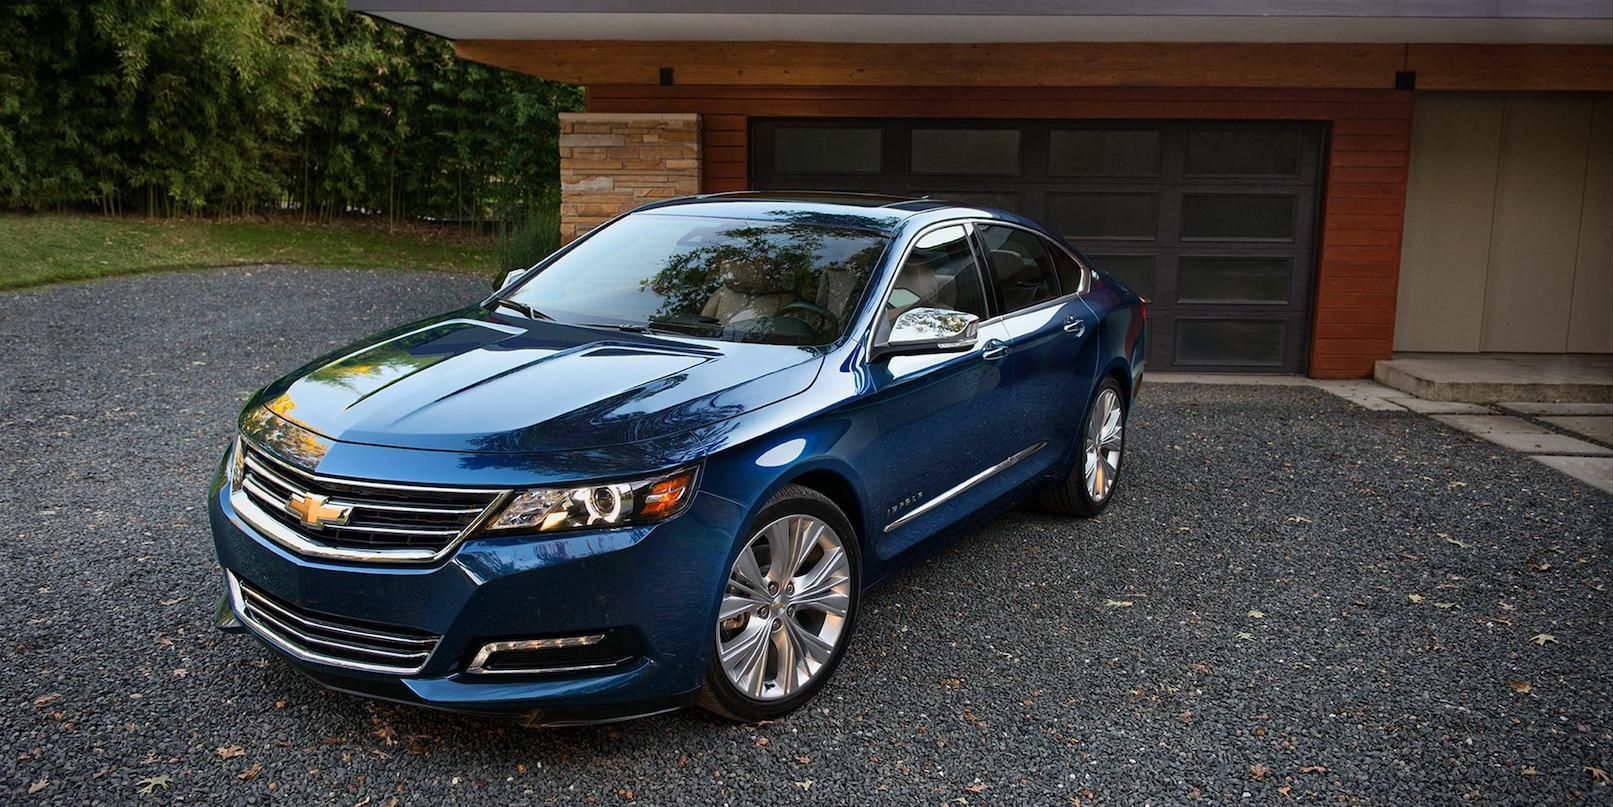 2018 Chevrolet Impala Financing in Jackson, MI